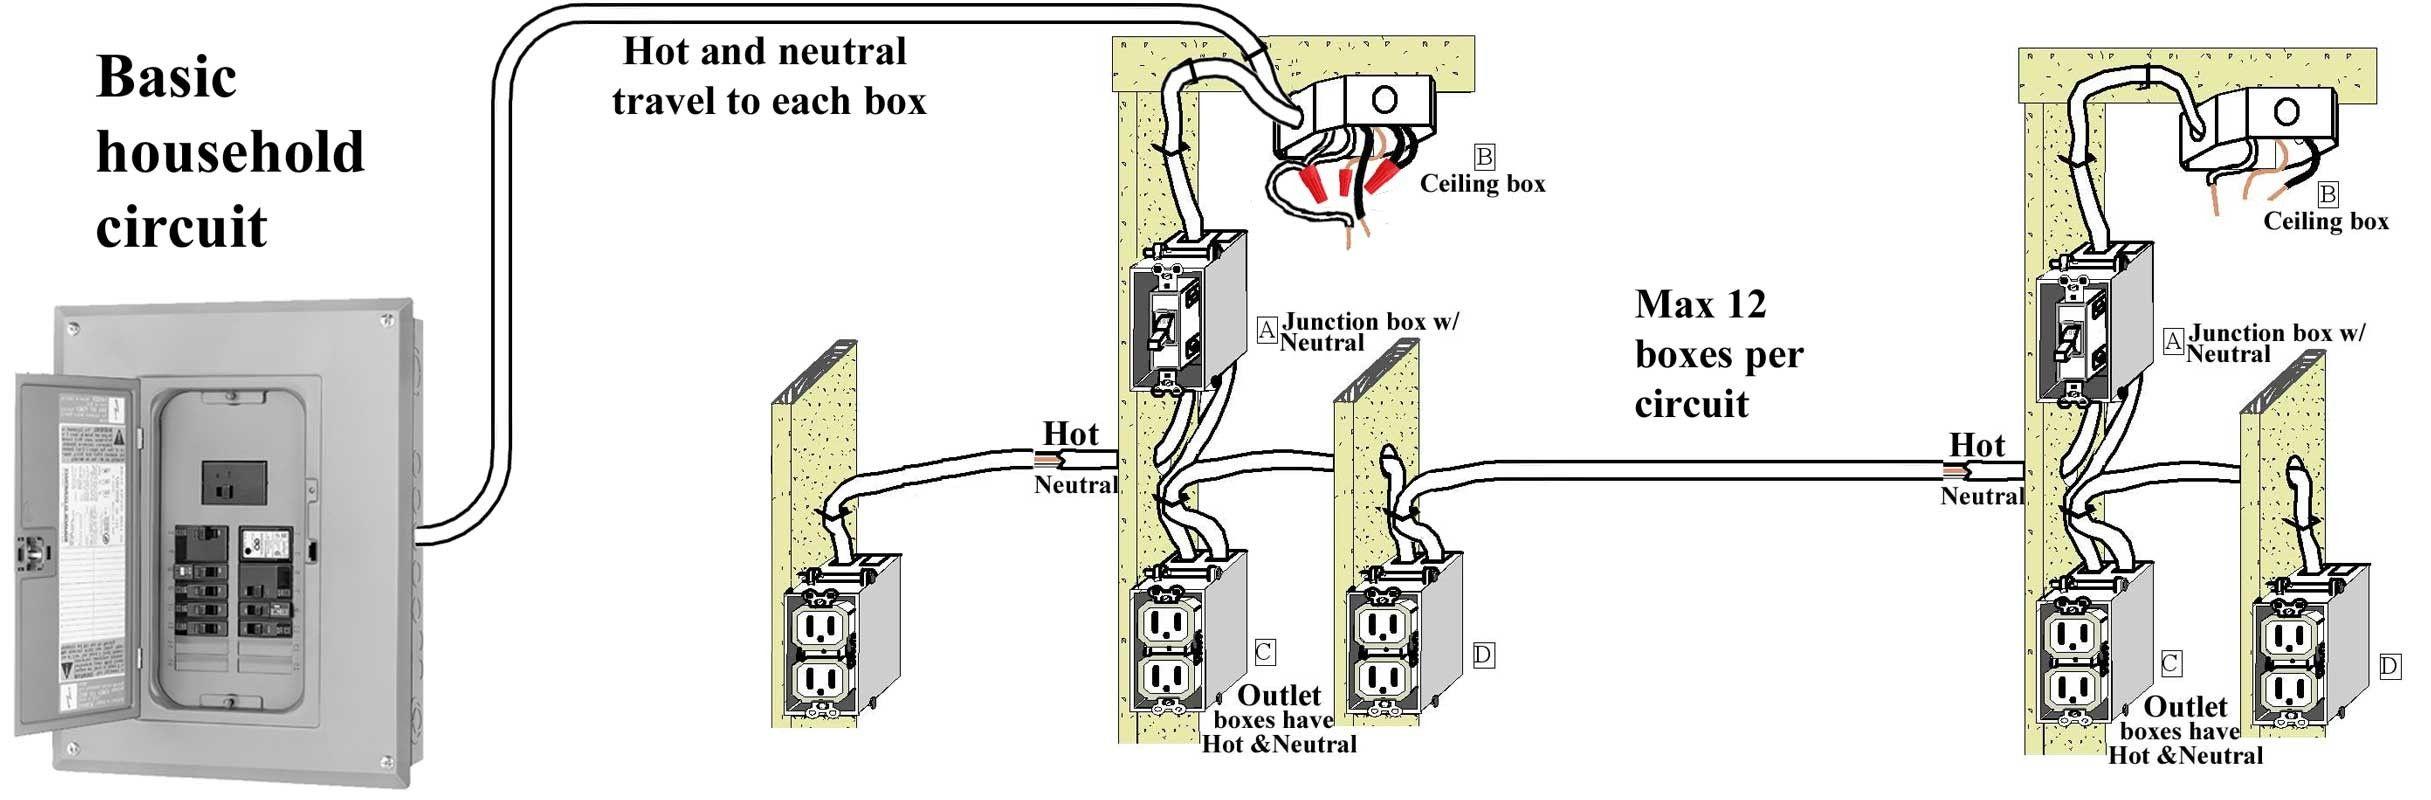 medium resolution of domestic electrical wiring diagram books diagram diagramtemplate diagramsample